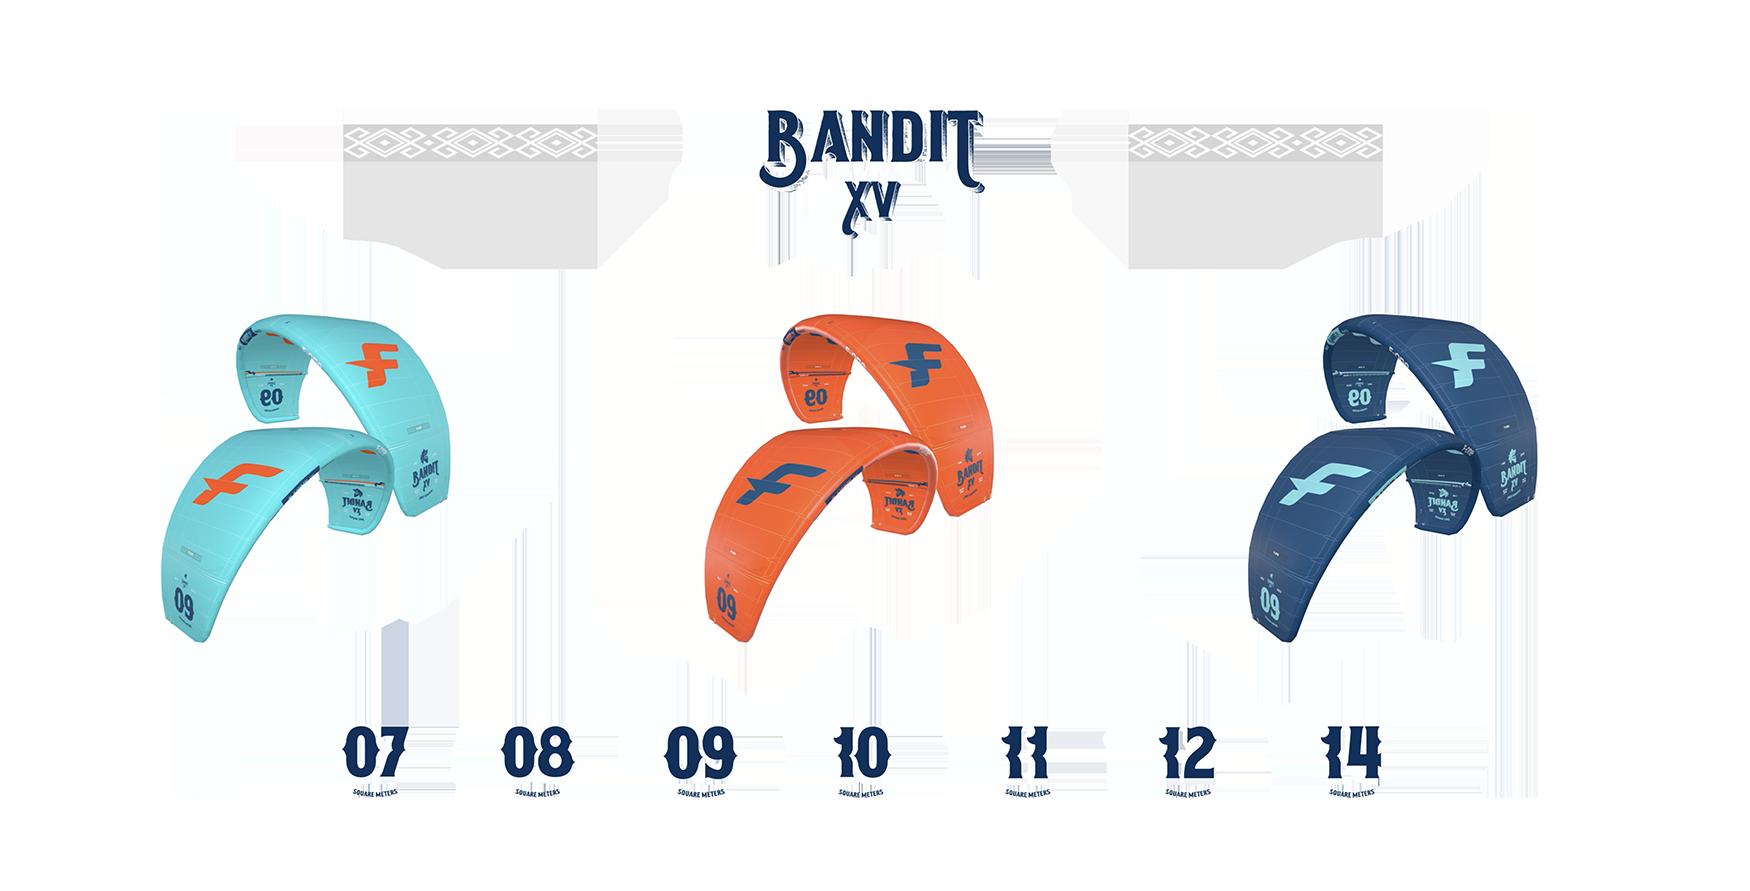 NEWS OF BANDIT XV - v2